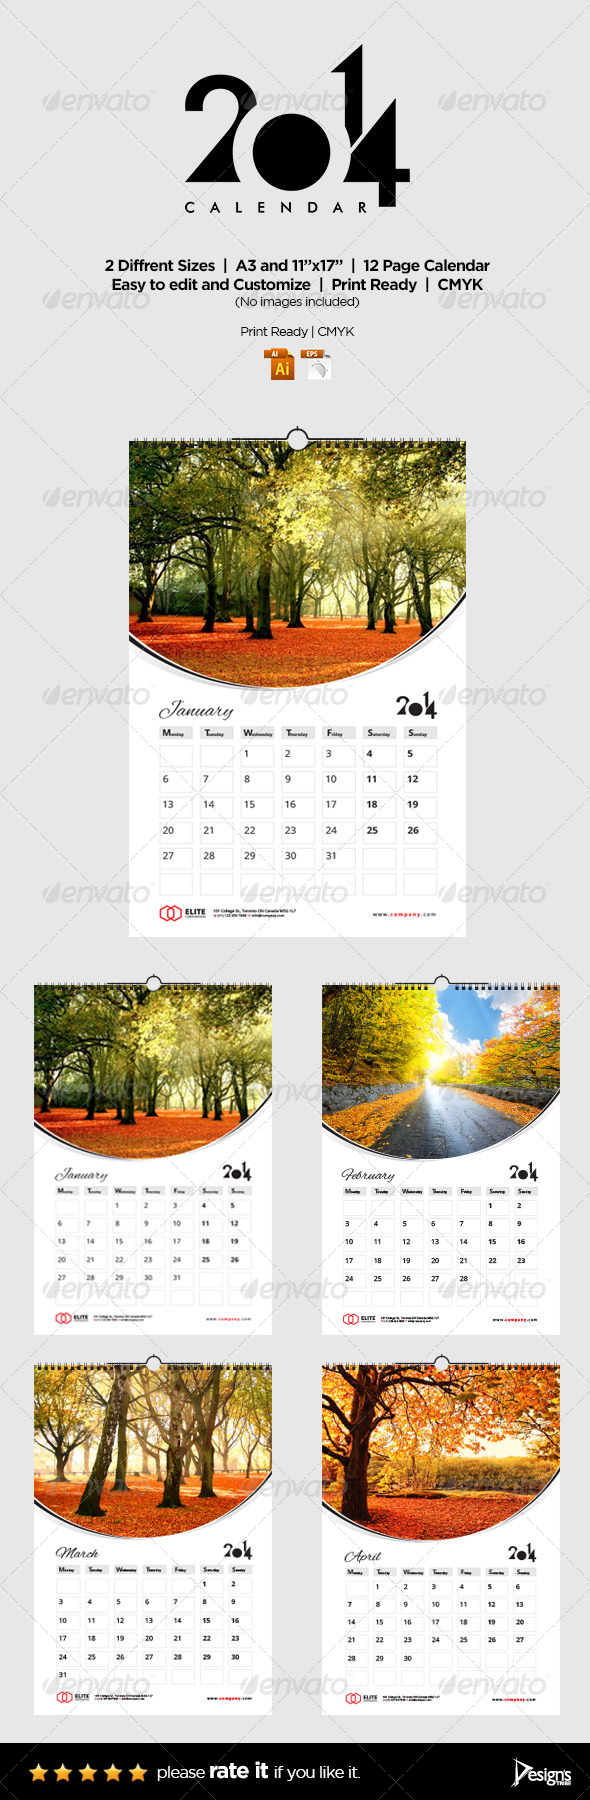 Wall Calendar 2014 Vol 2 - Calendars Stationery